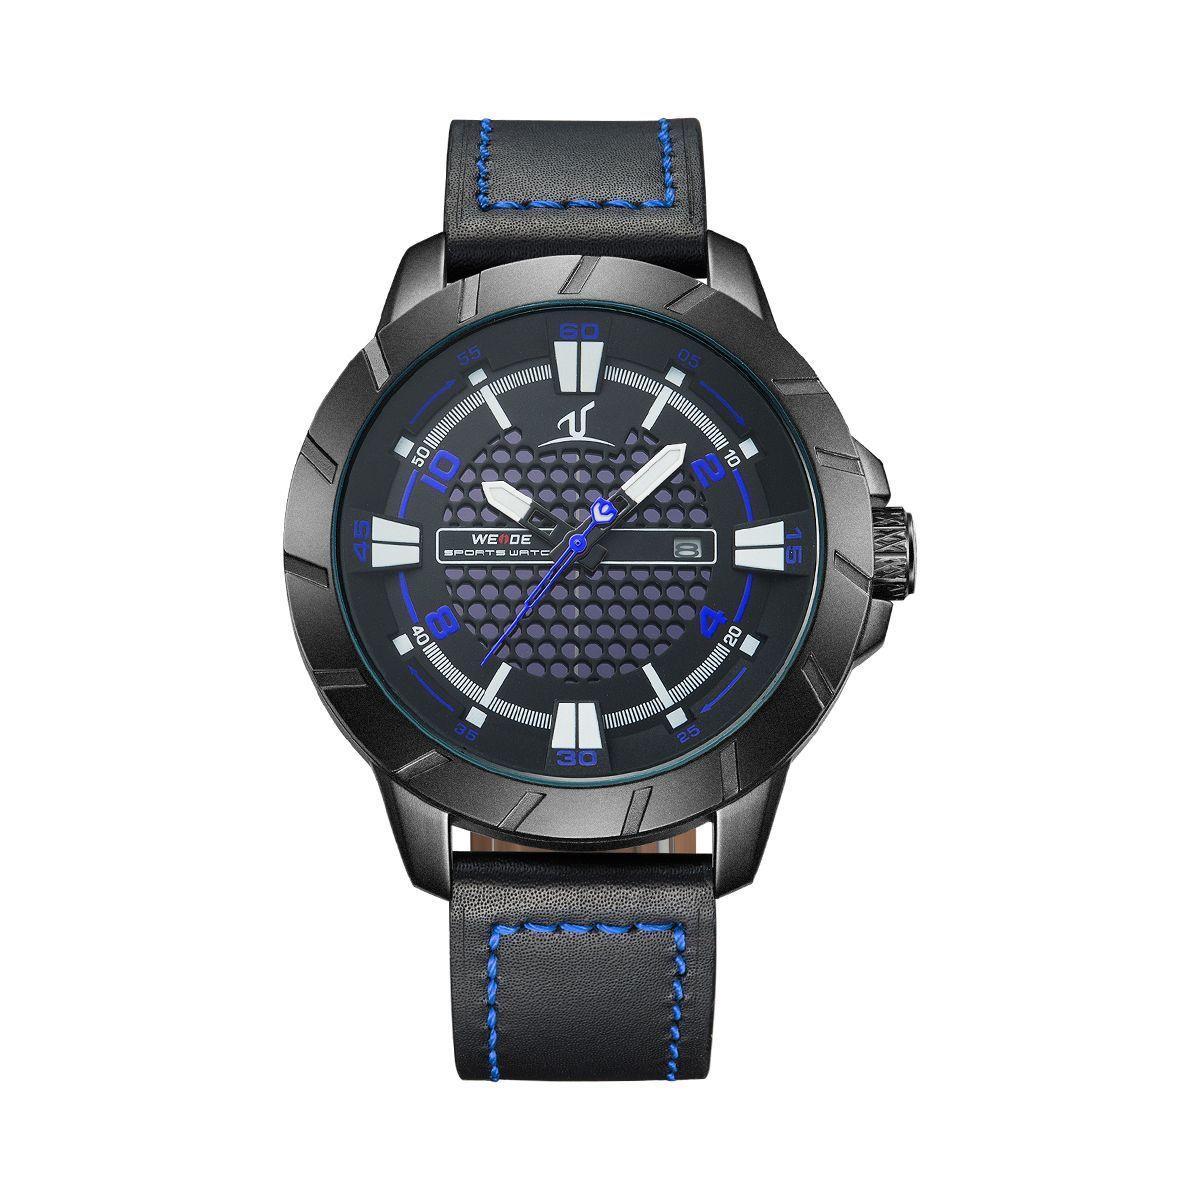 Часы Weide Blue UV1608B-4C (UV1608B-4C)